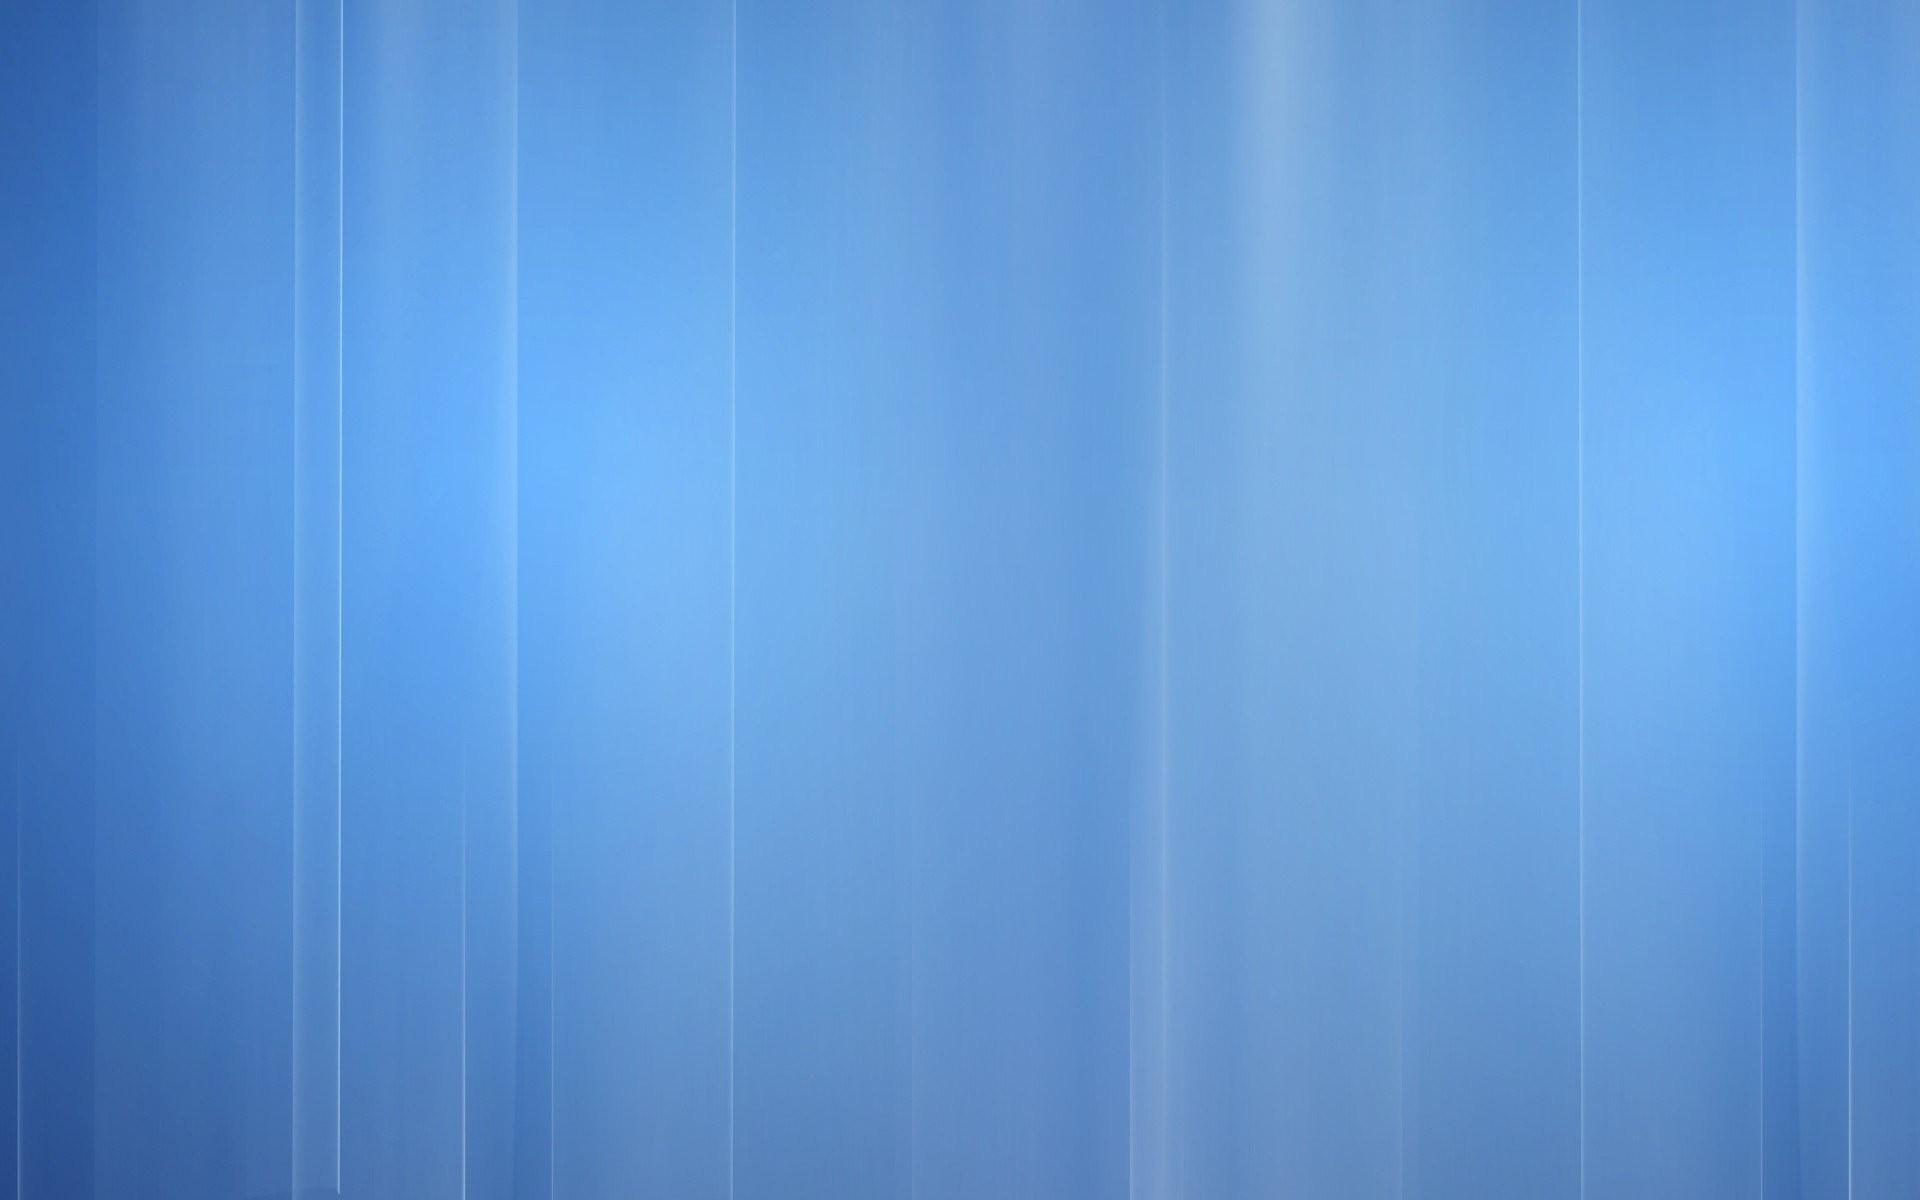 Plain blue background wallpaper wallpapertag - Plain green background ...